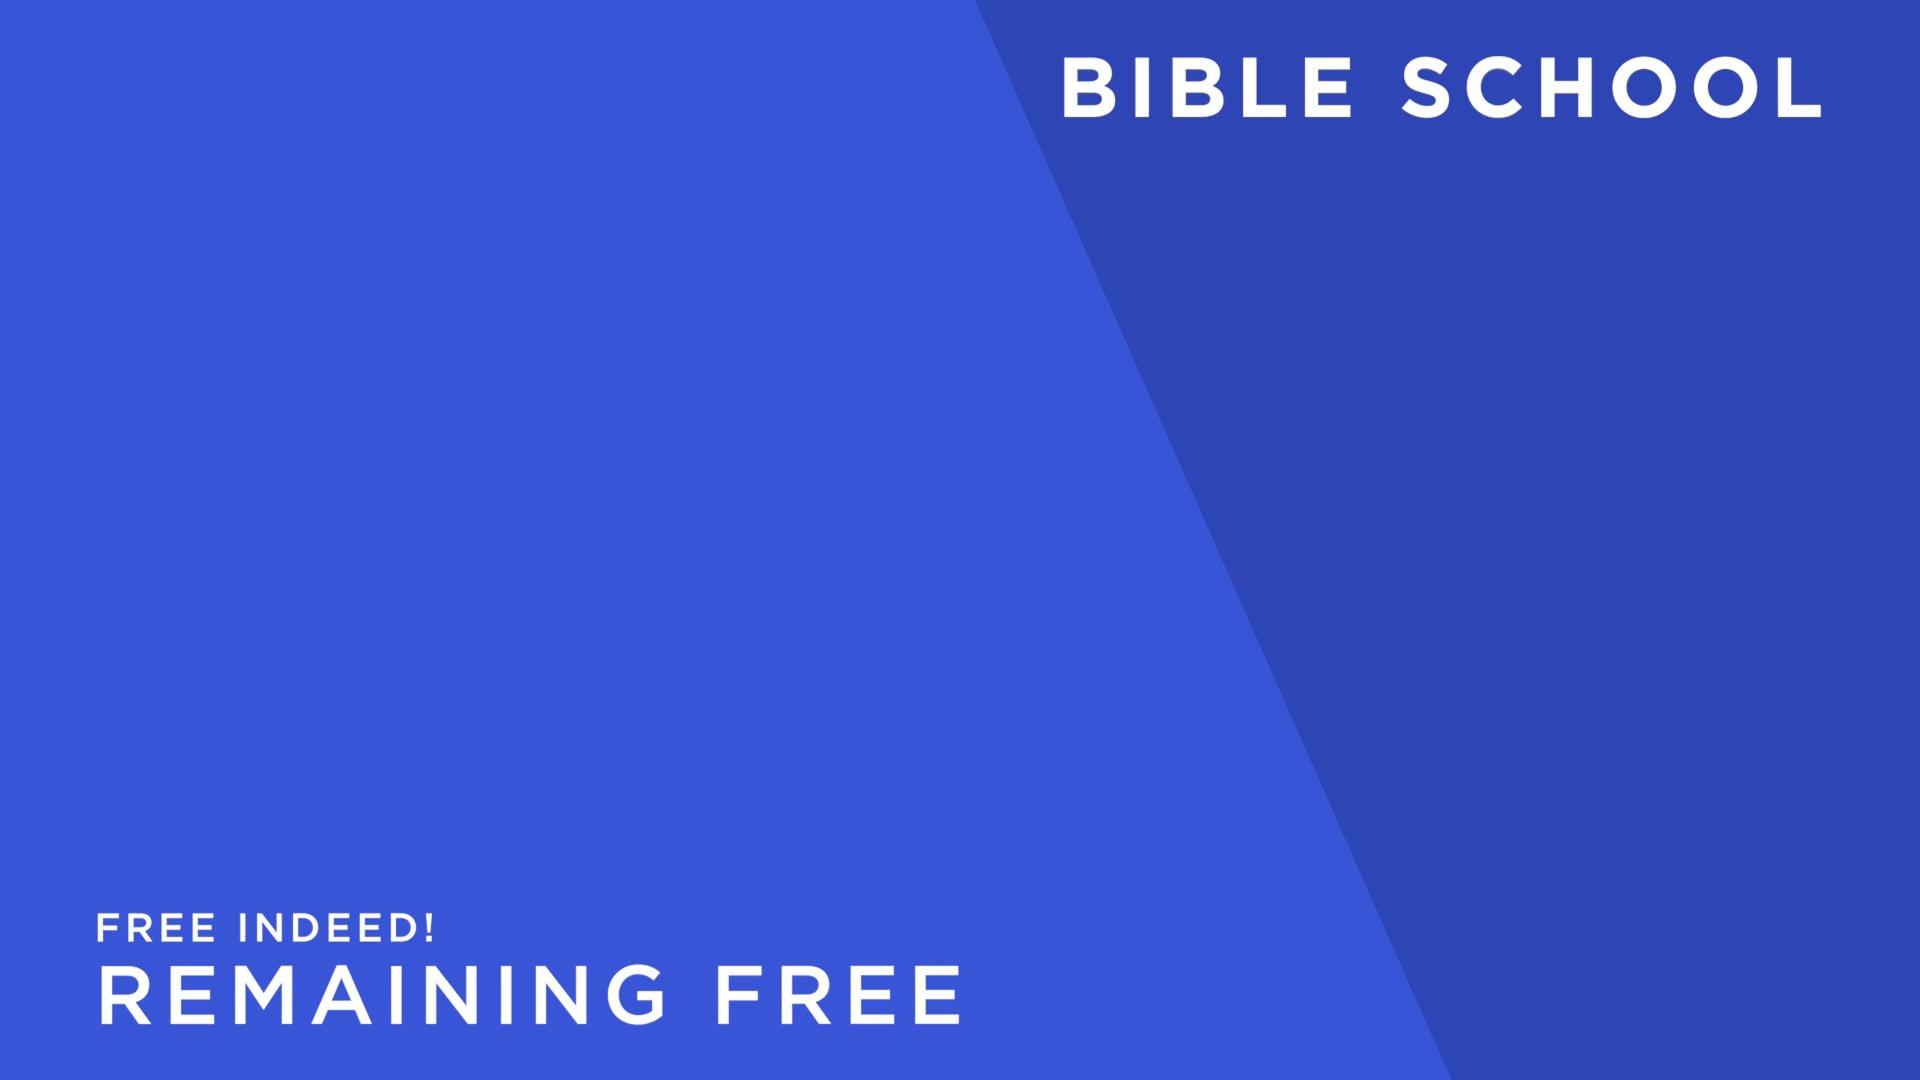 Free Indeed! [13] Remaining Free